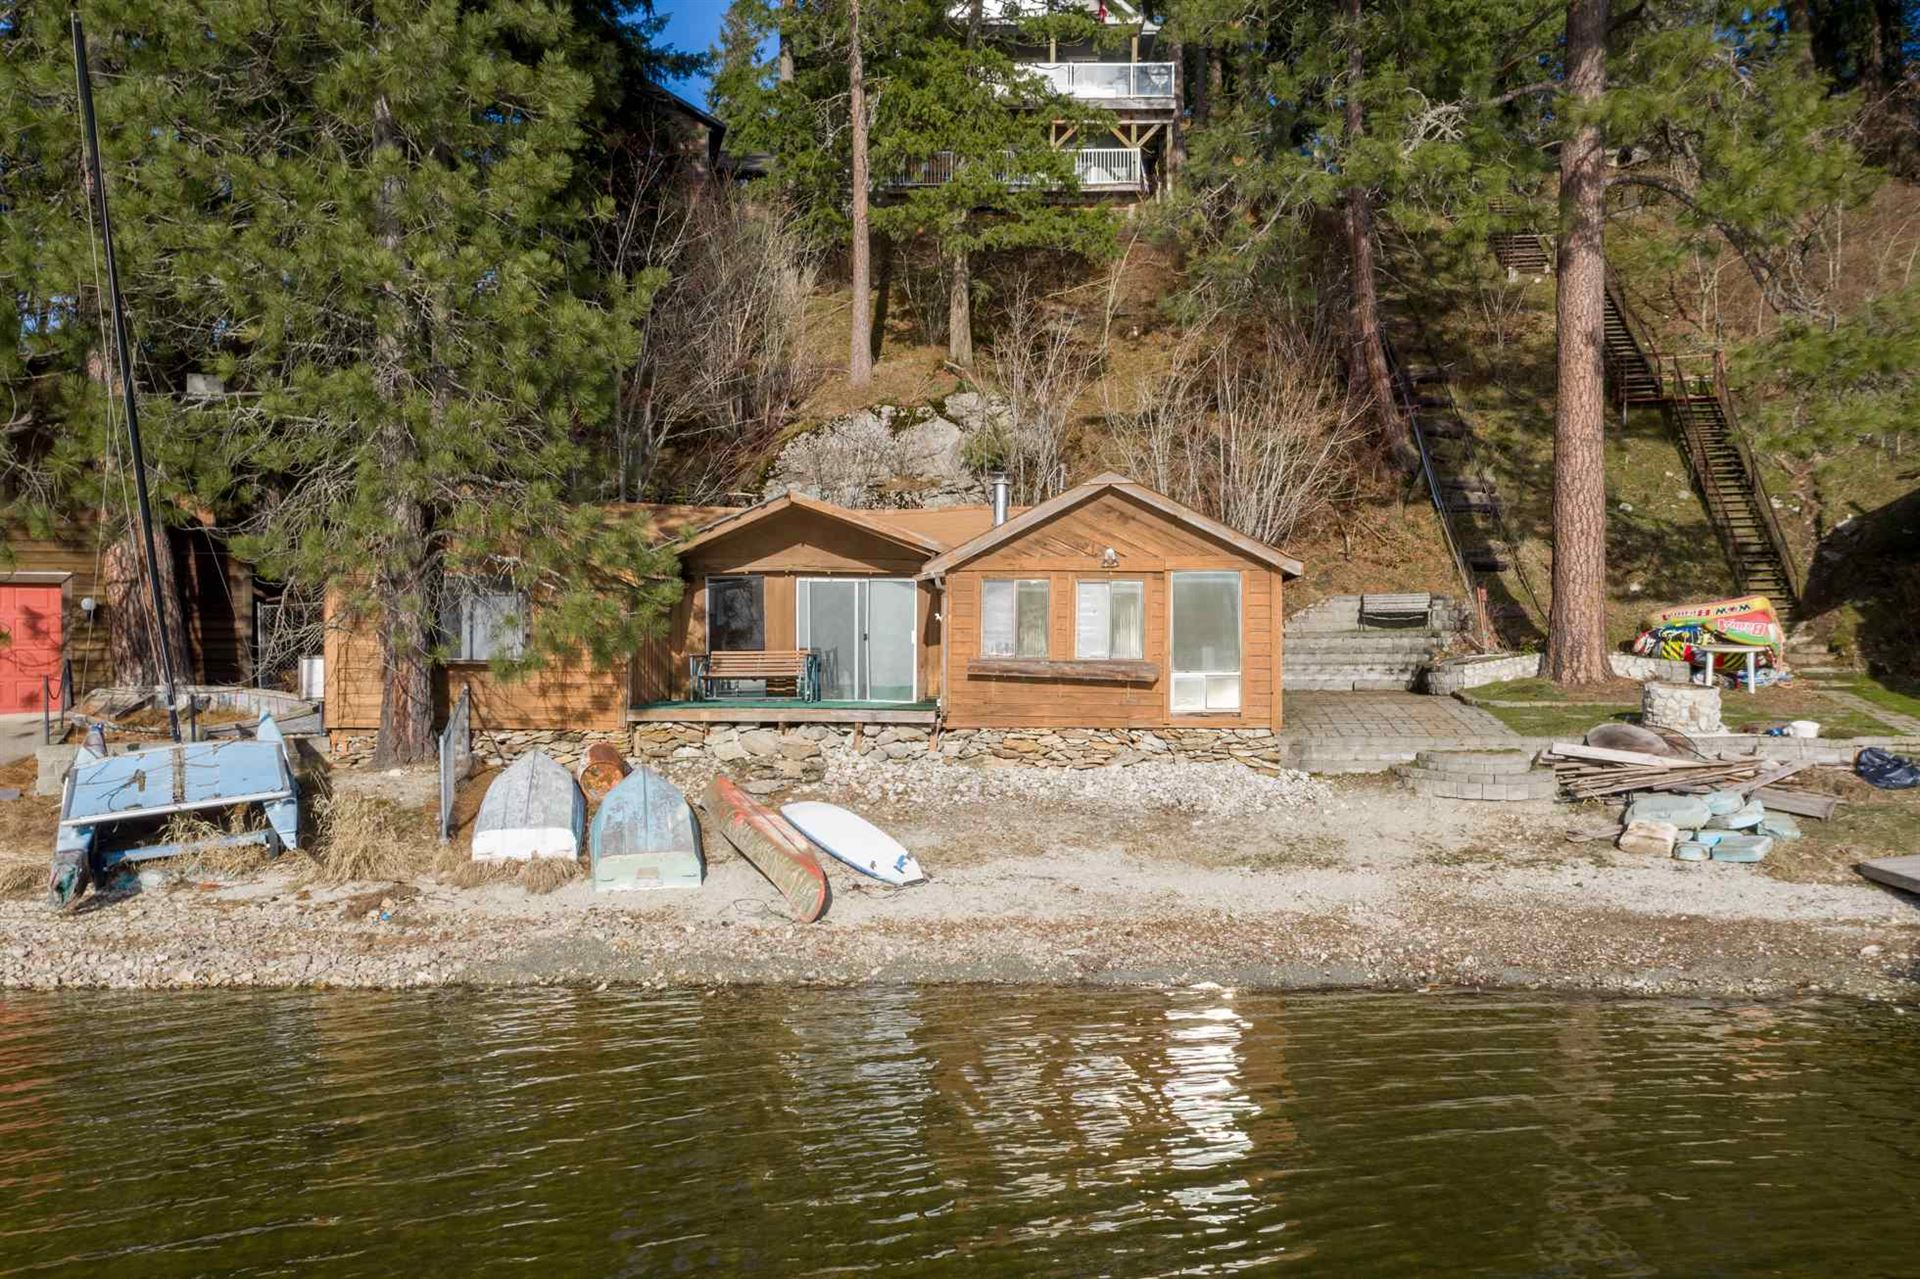 13229 N Peninsula Dr, Newman Lake, WA 99025 - #: 202113181